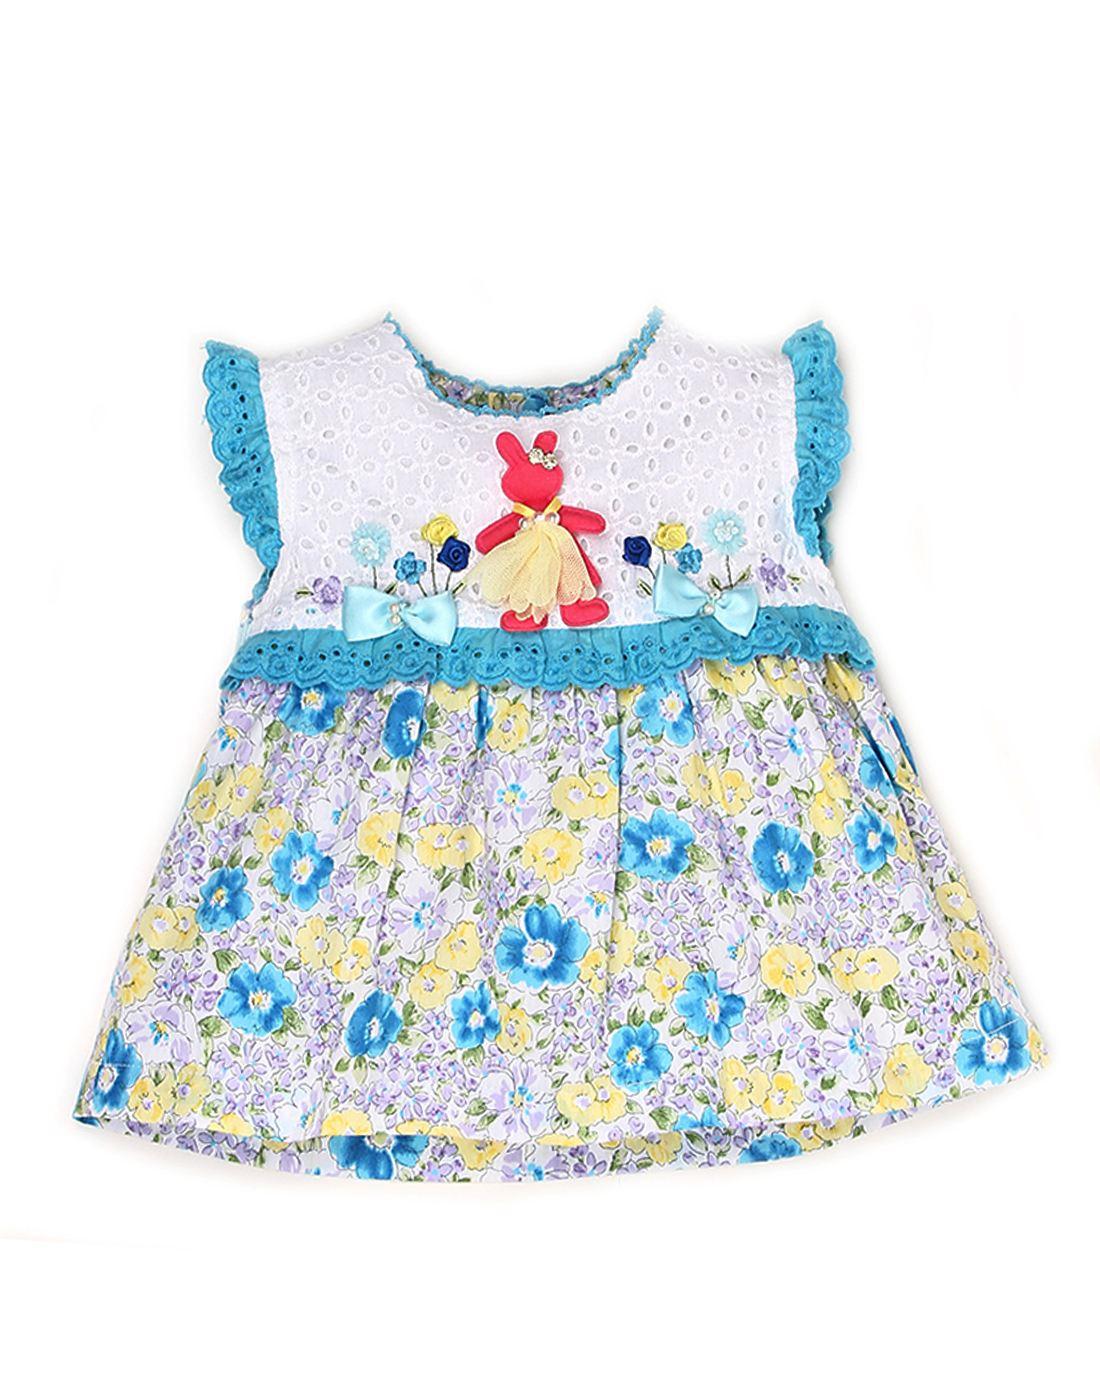 K.C.O 89 Baby Girls Casual Printed Sleeveless Frock